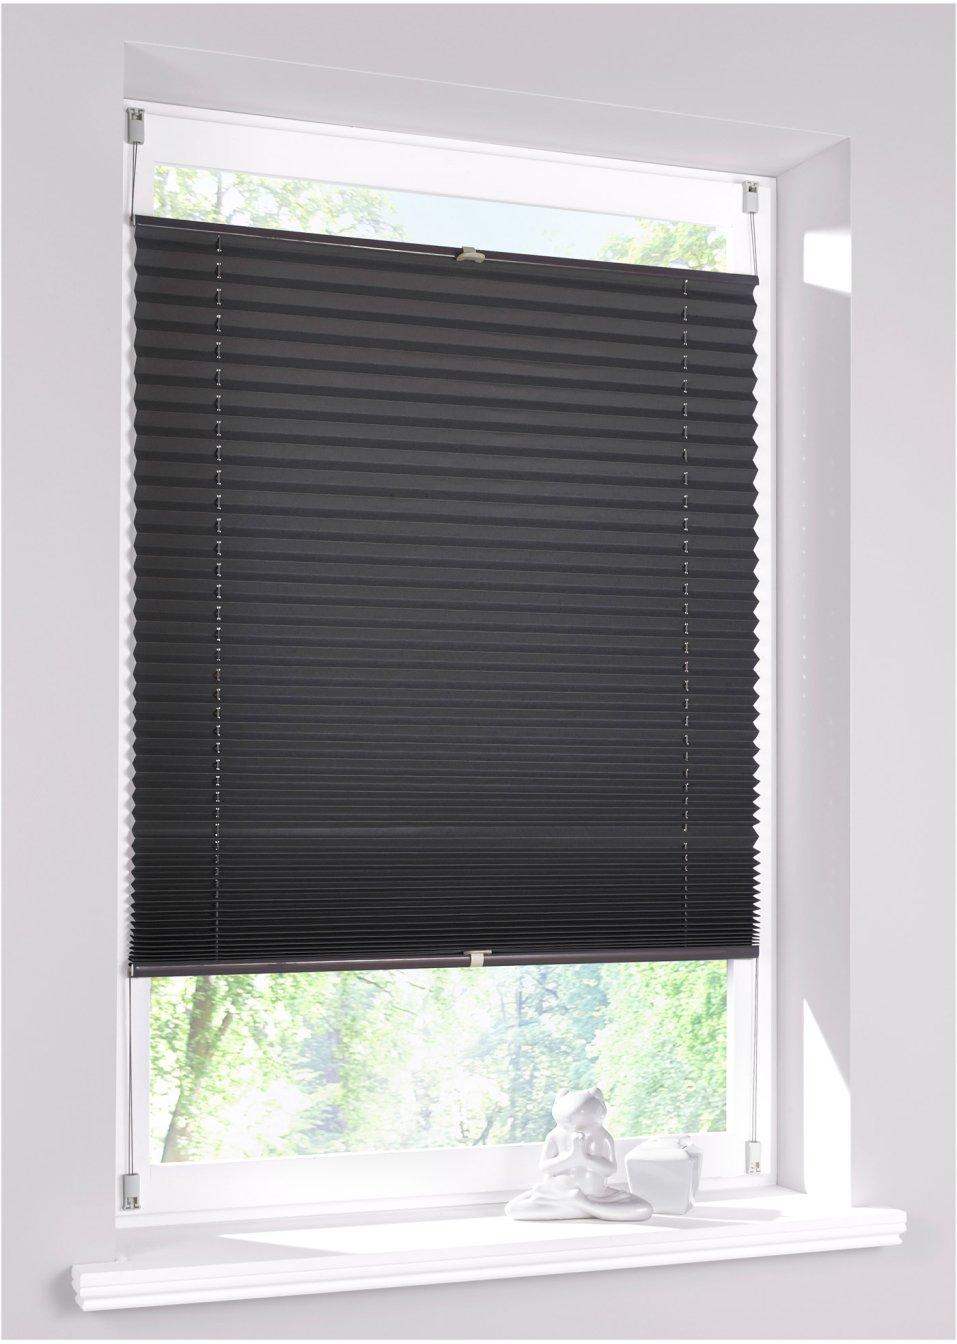 pliss verduistering grijs bpc living koop online. Black Bedroom Furniture Sets. Home Design Ideas